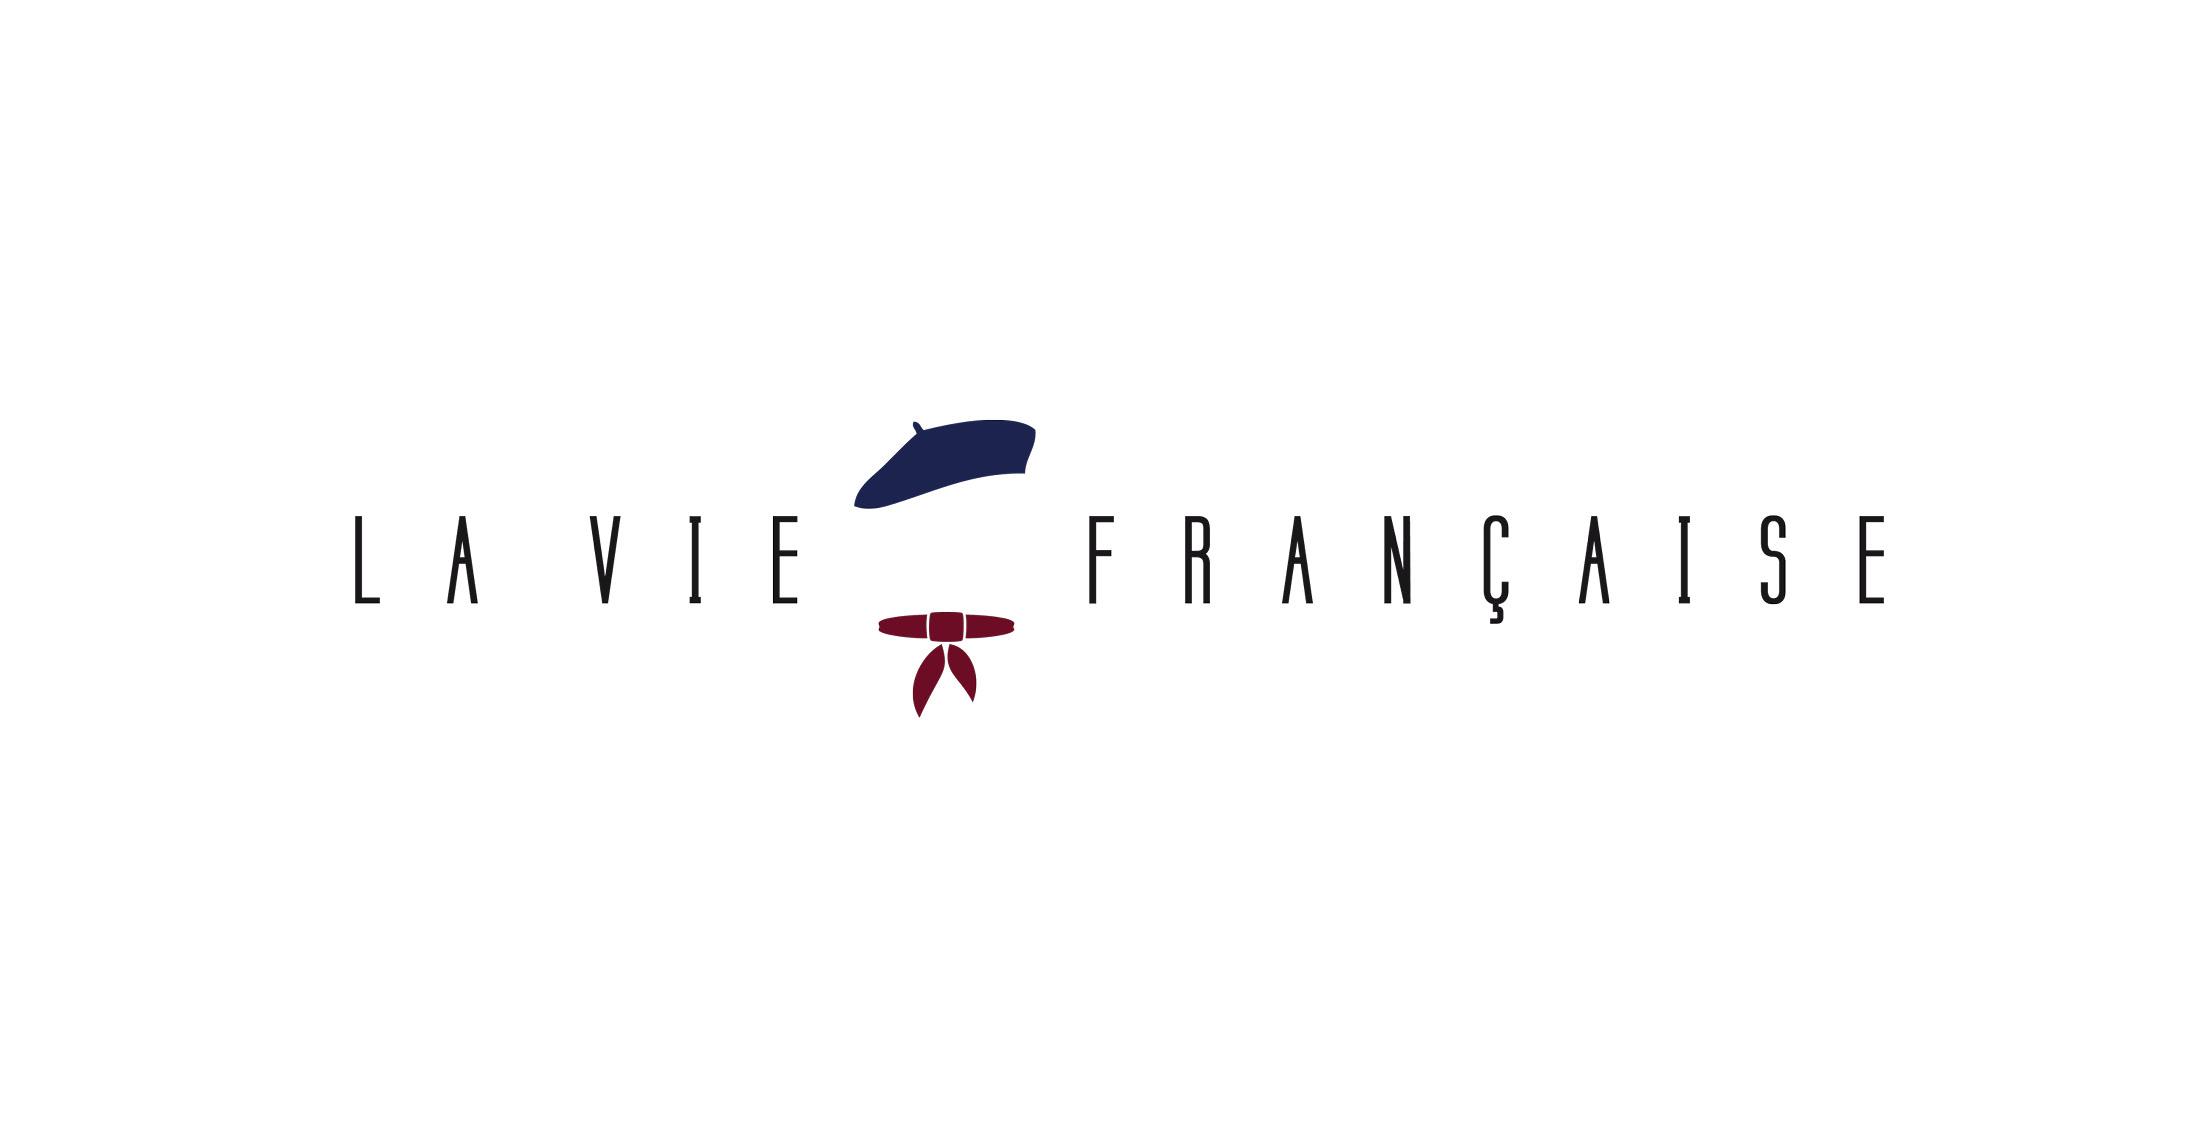 vie francaise2